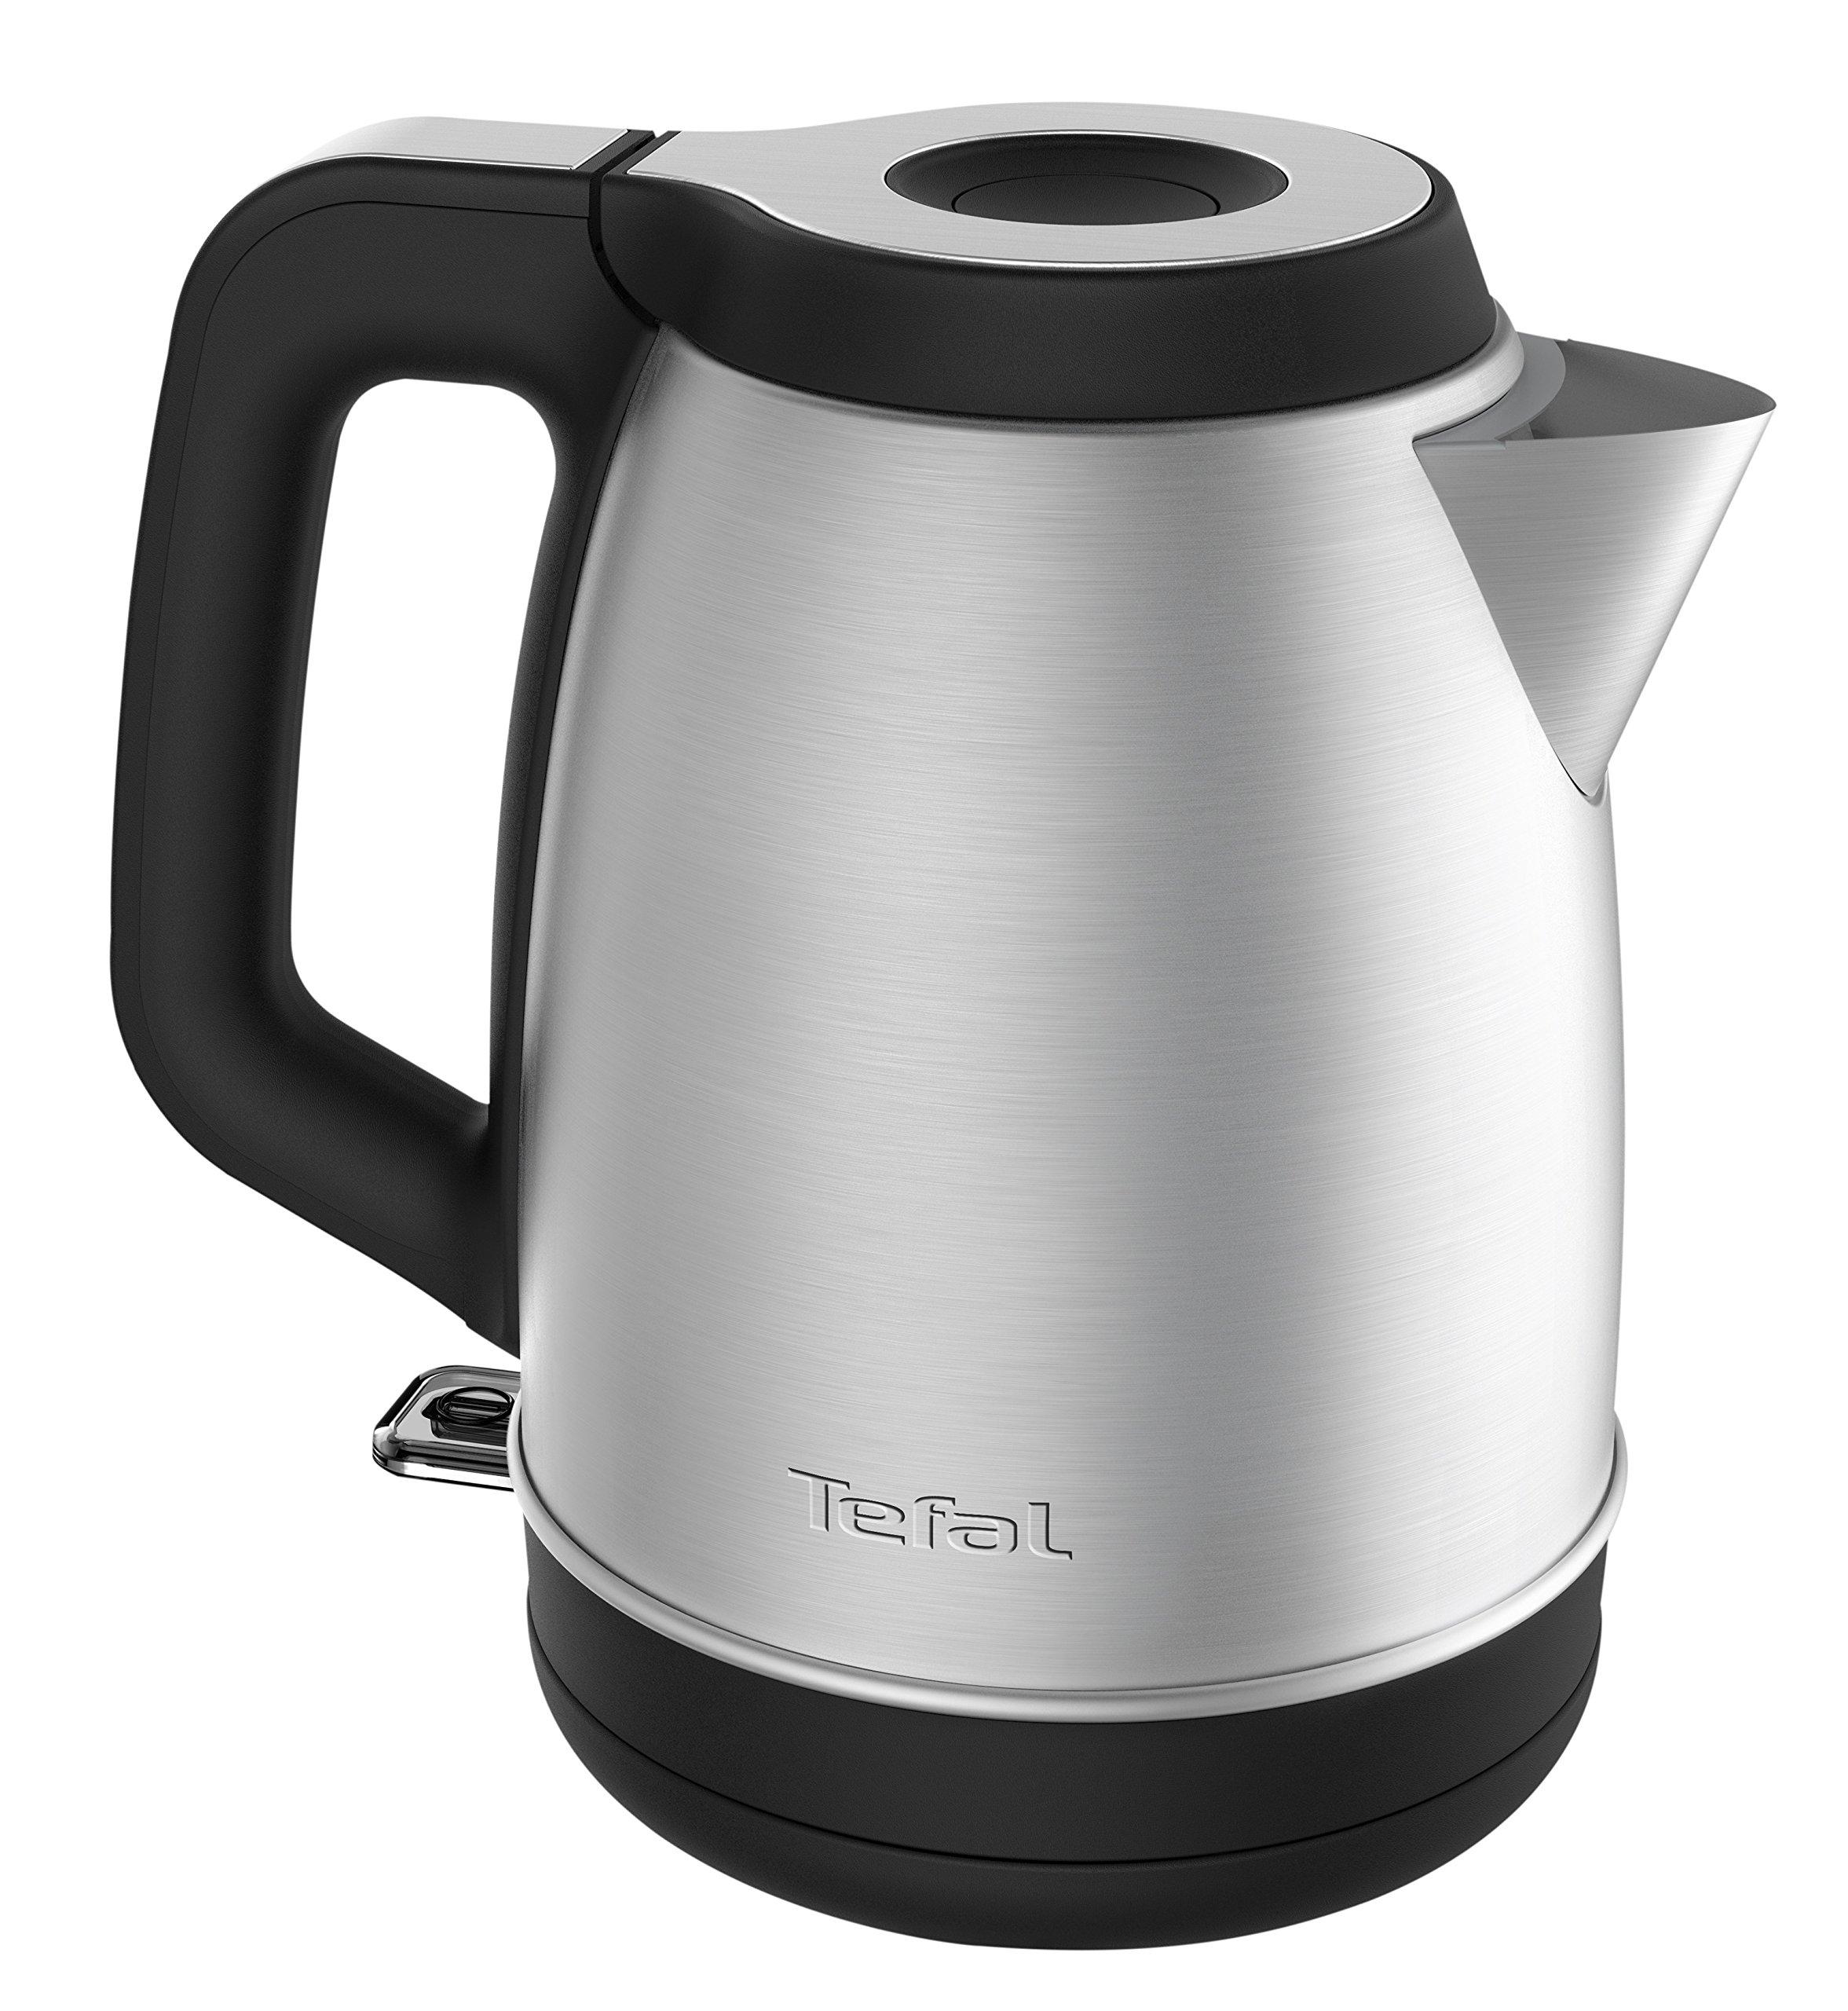 Tefal-Element-KI280D-Wasserkocher-Edelstahl-17-Liter-schwarz